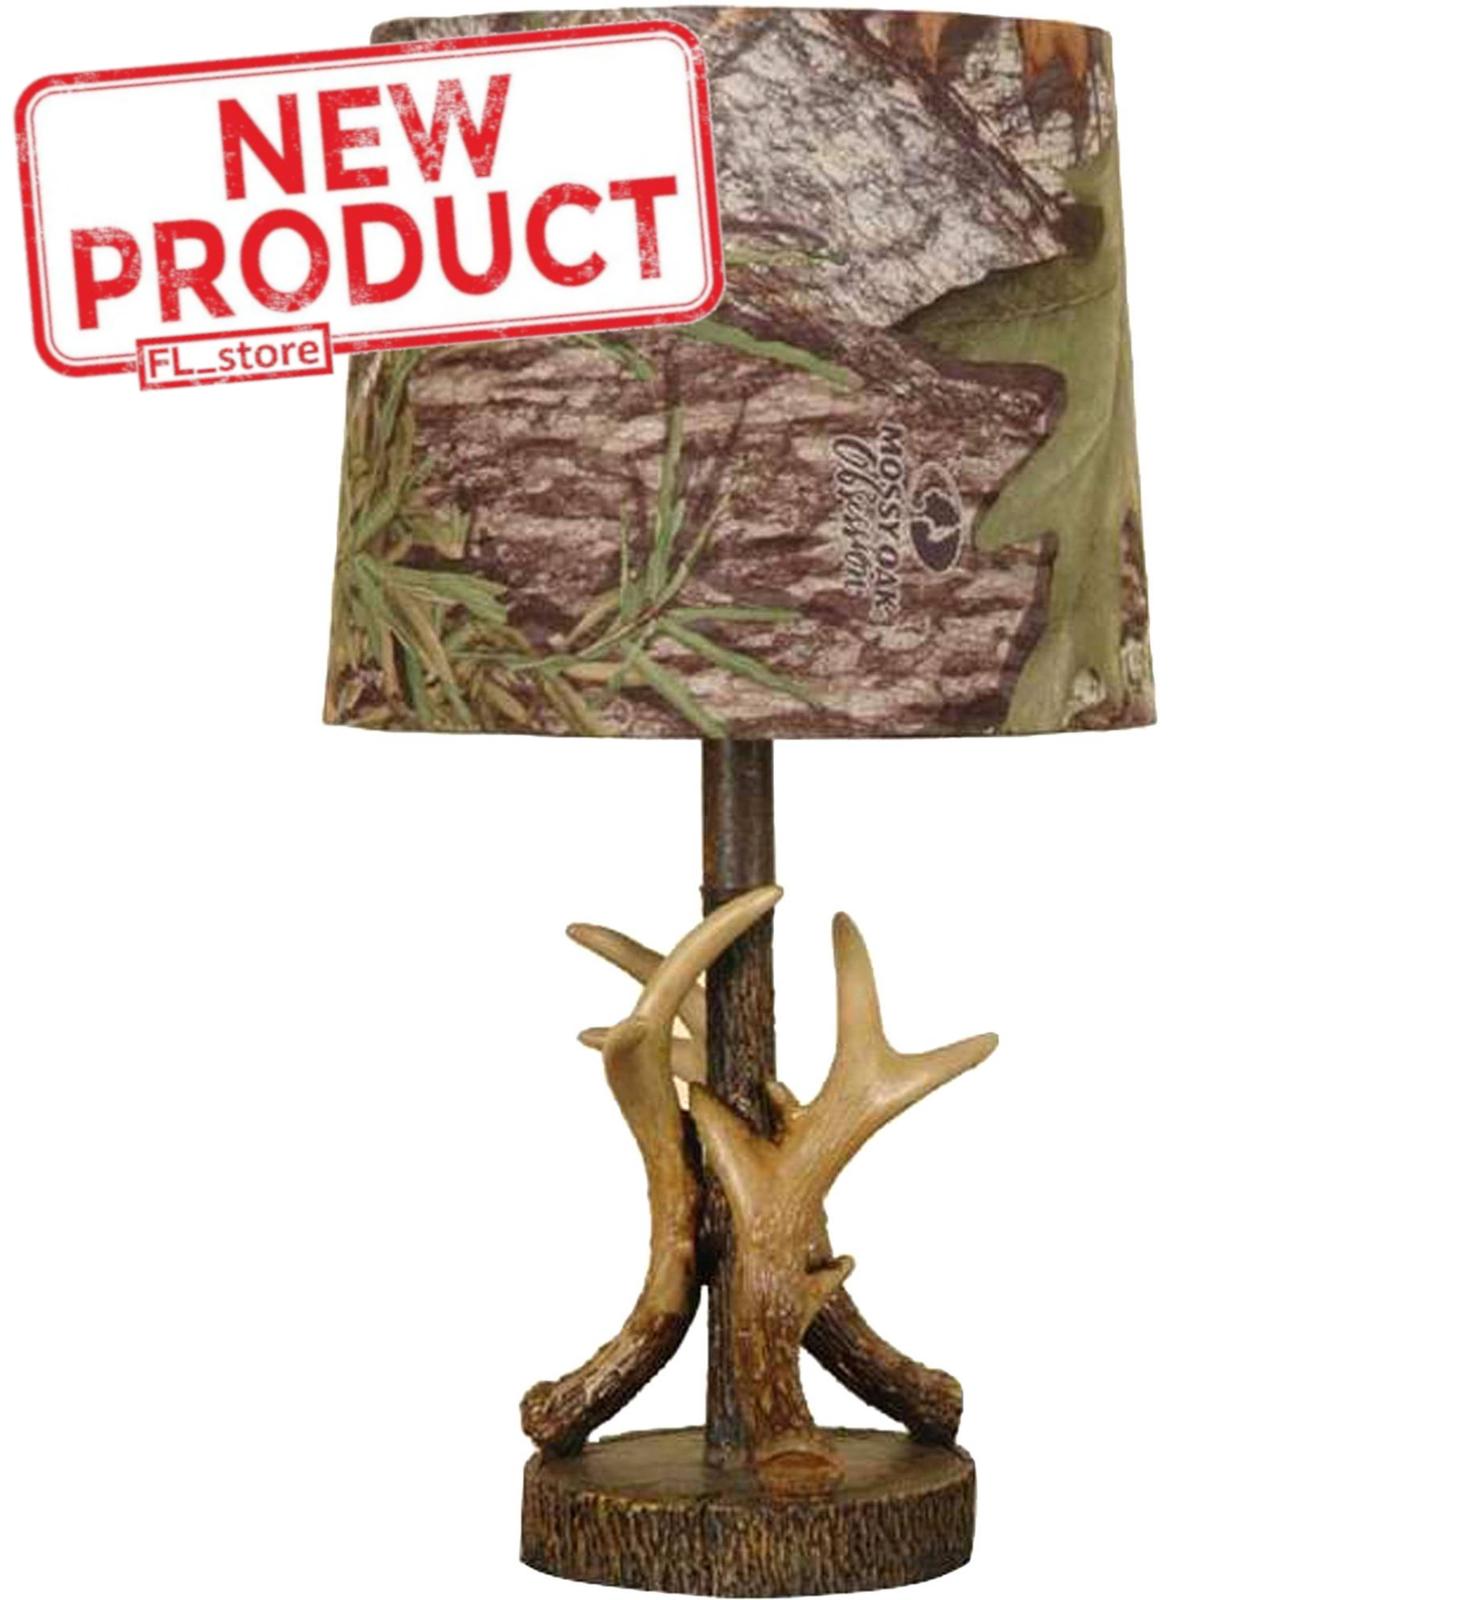 Mossy Oak Deer Antler Accent Lamp For Sale Online Ebay